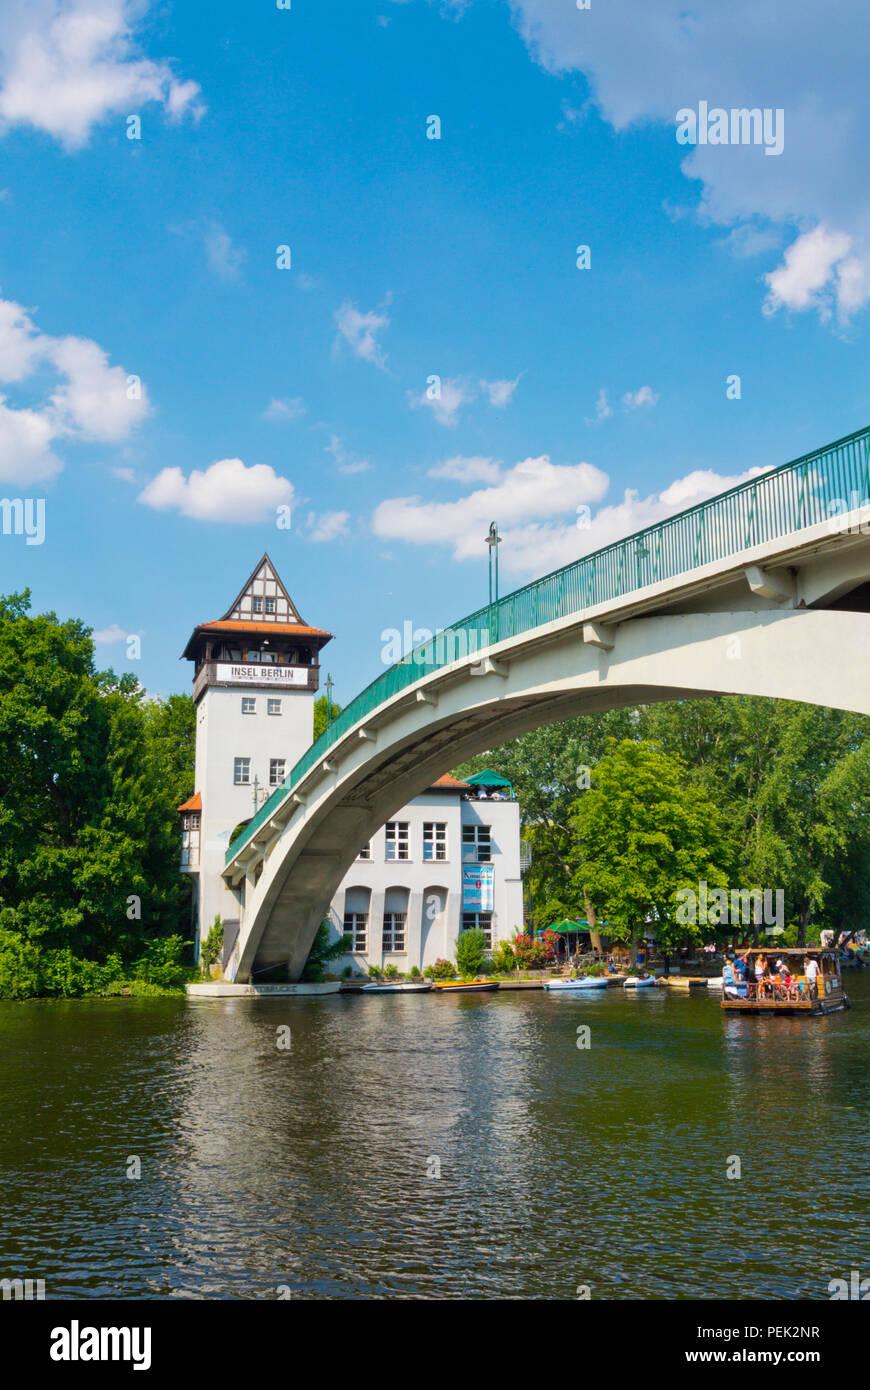 Bridge leading to Insel der Jugend, Treptower Park, Alt-Treptow, Berlin, Germany Stock Photo